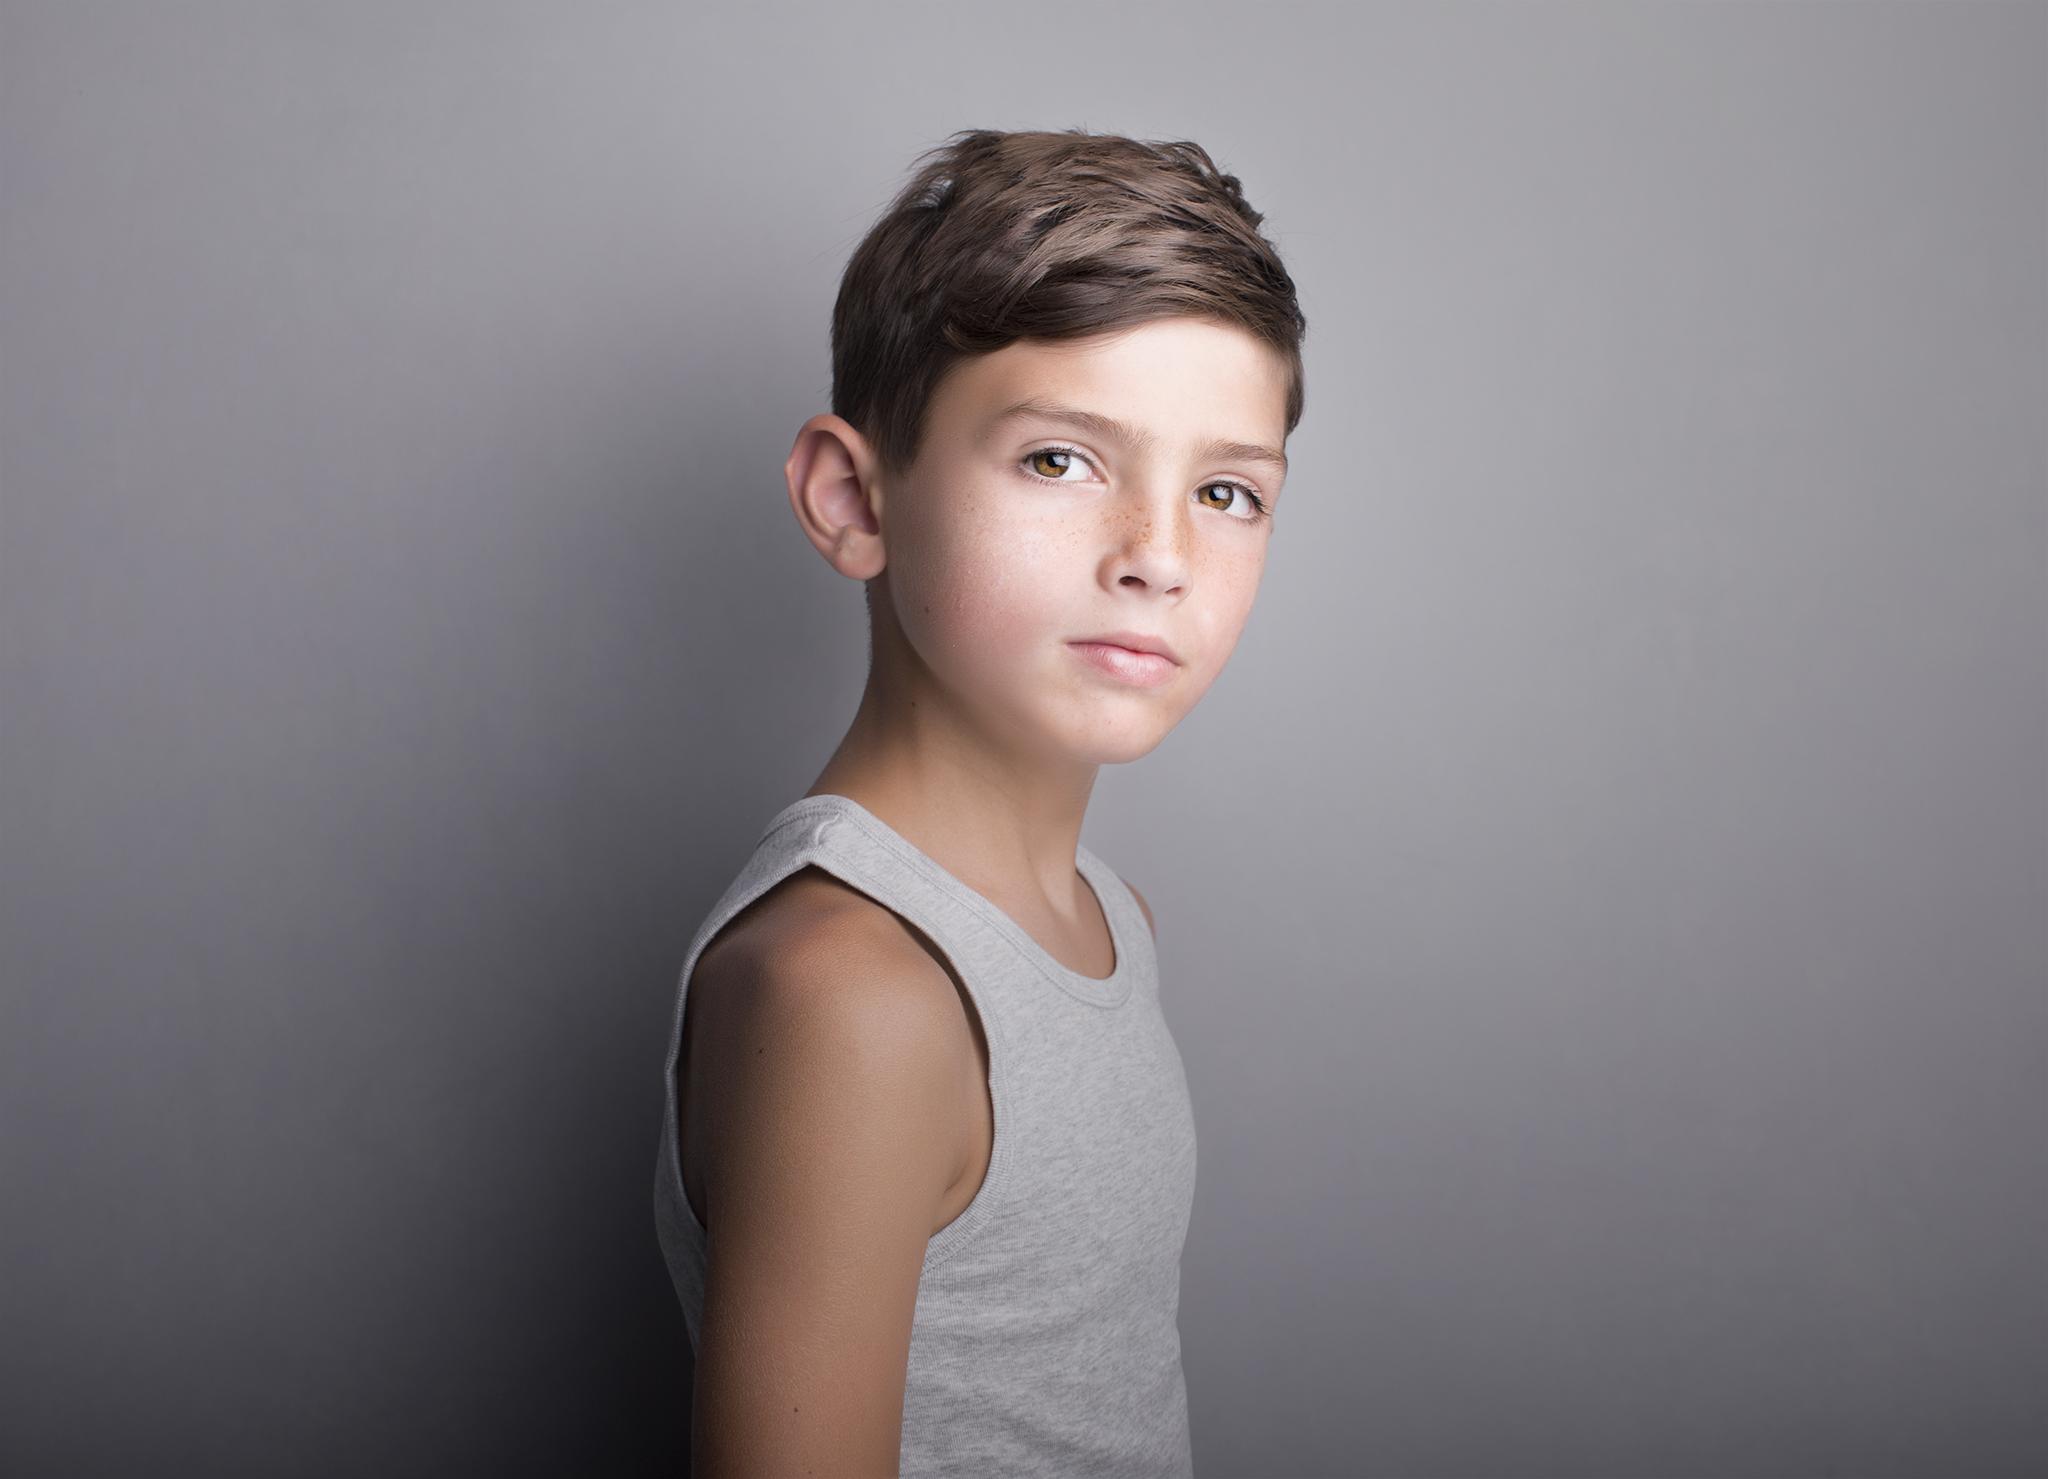 elizabethgfineartphotography_kingslangley_model_actor_jack_mentormodel_rayandrobin_2.jpg